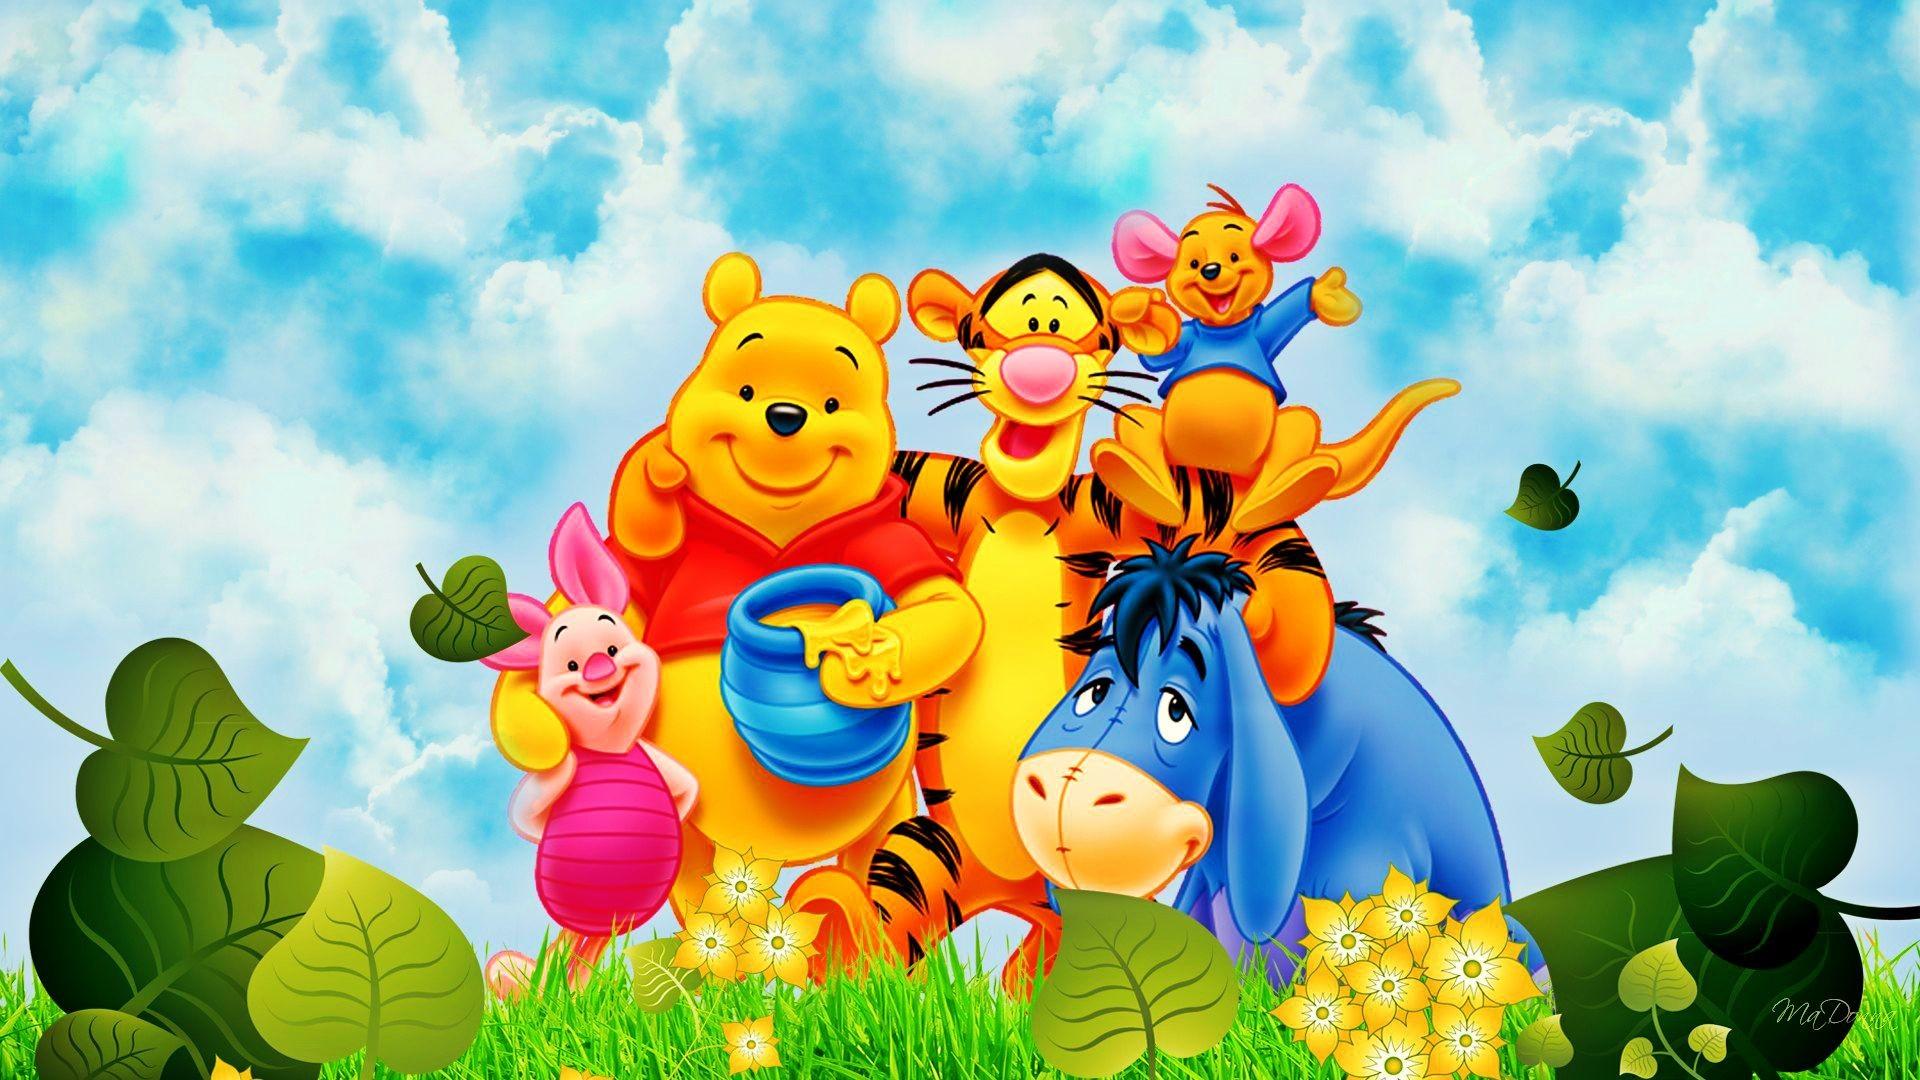 Winnie The Pooh Friends Wallpaper PC #267 Wallpaper | Wallpaper Screen .